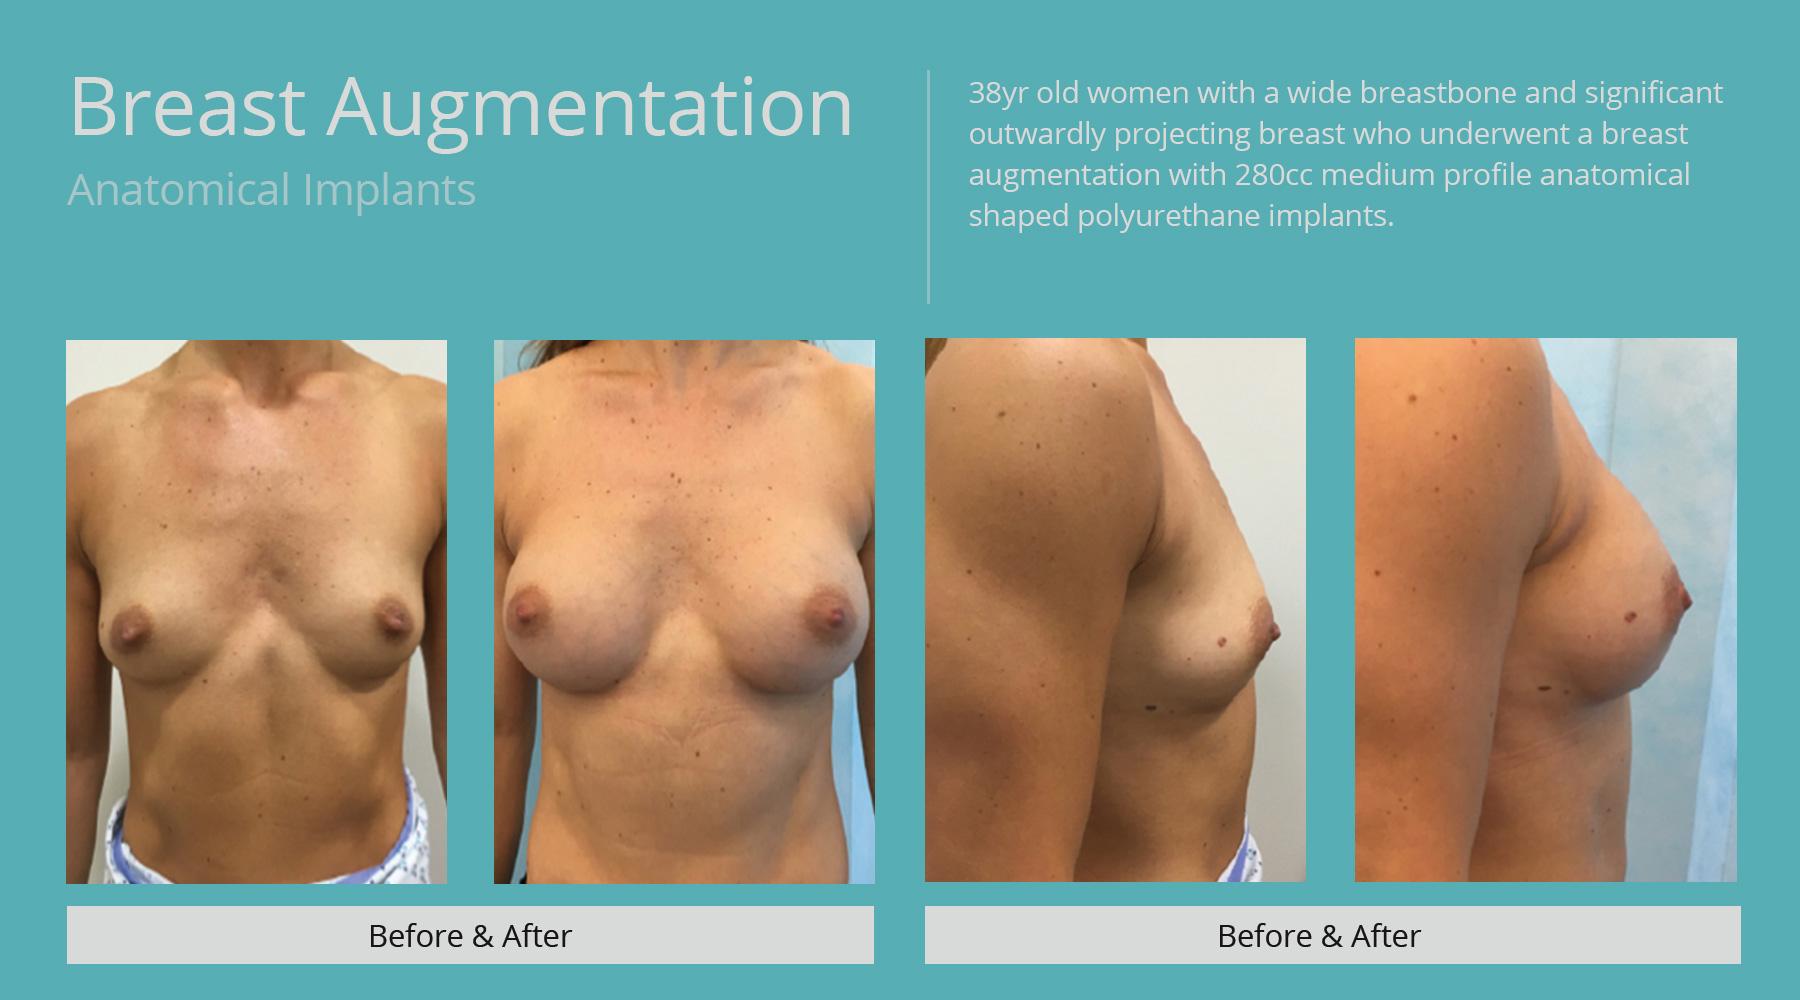 Breast-Augmentation-anatomical-16